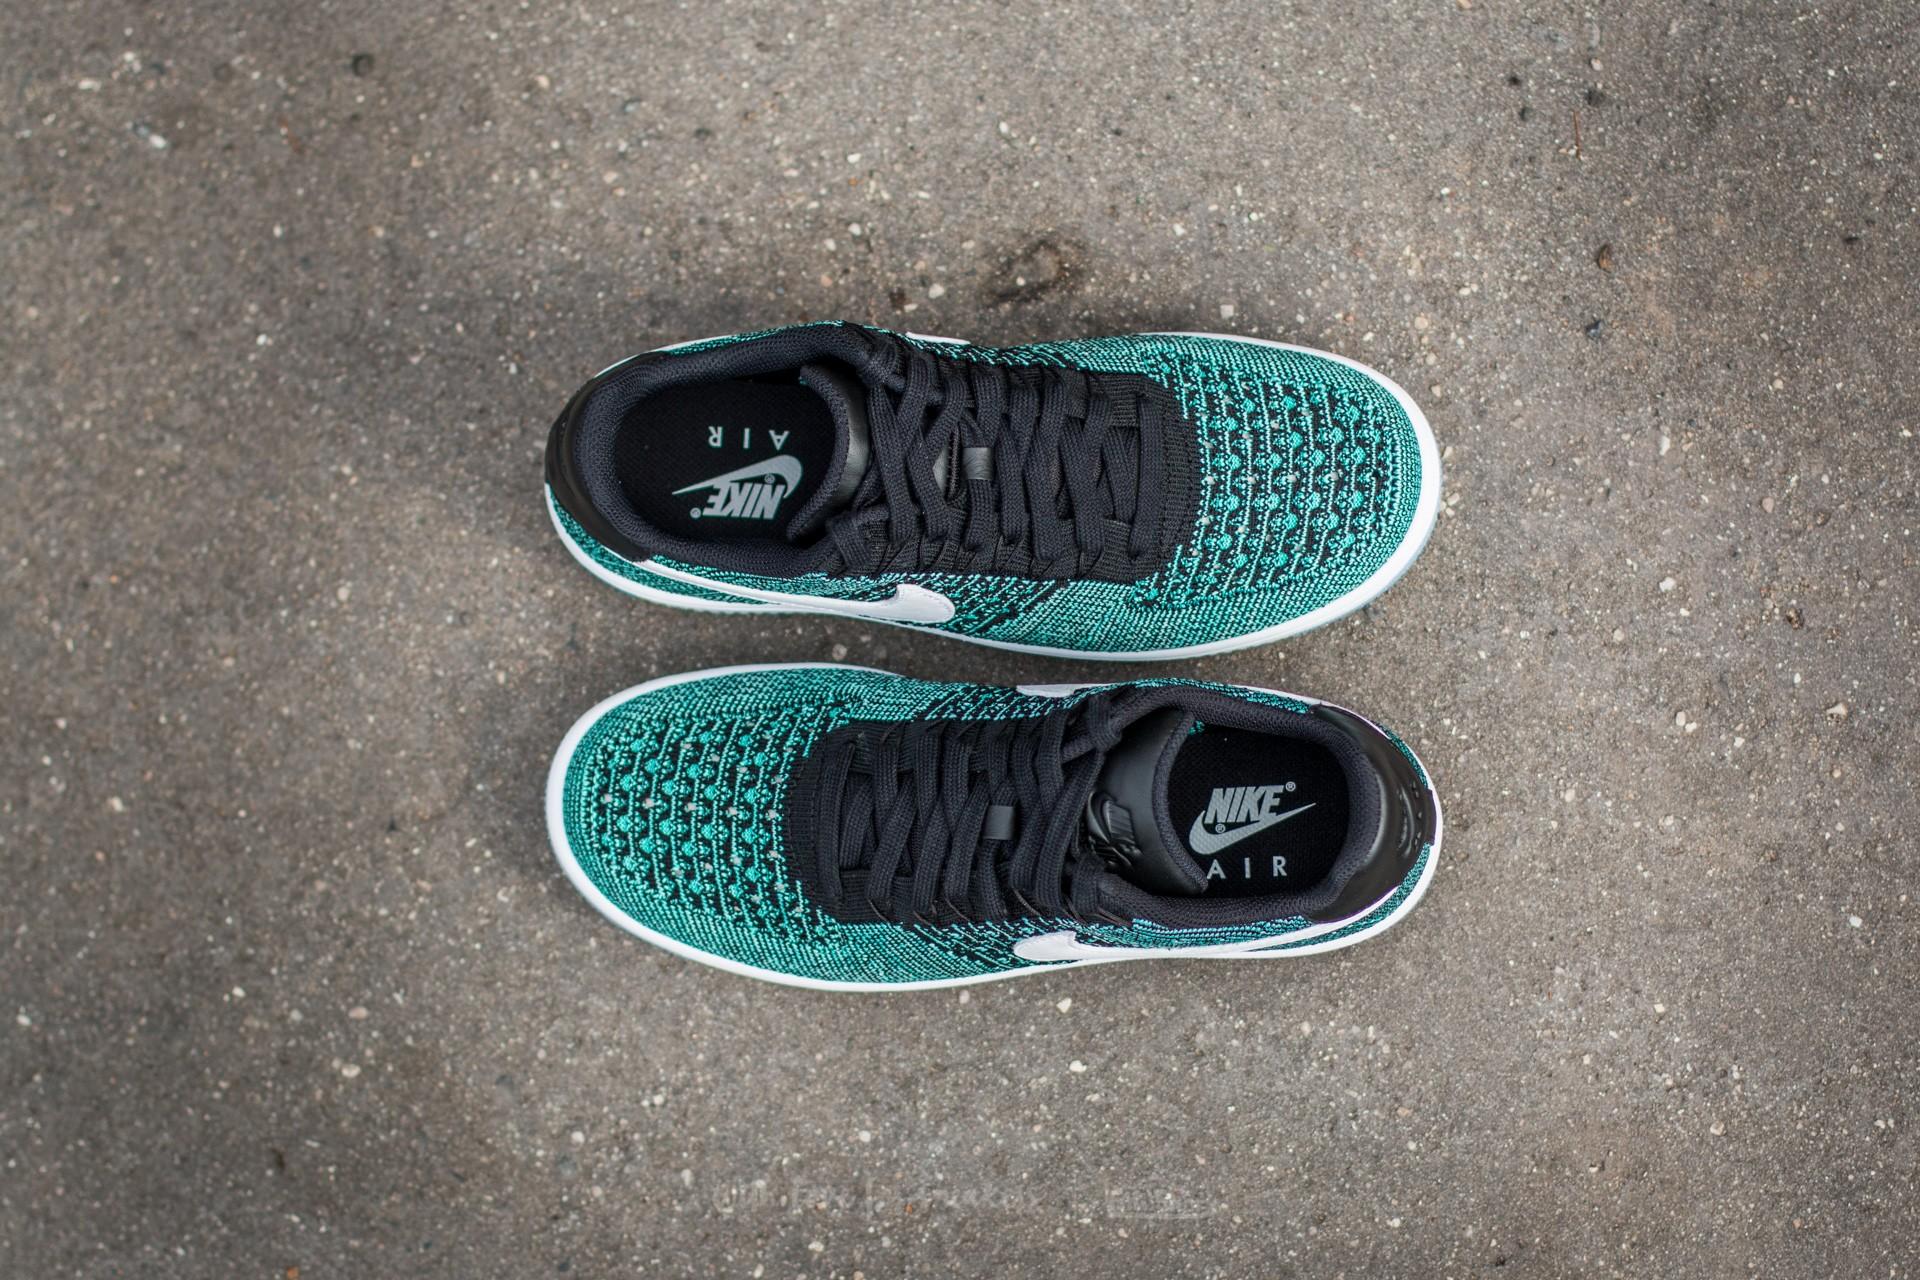 Nike Air Force 1 Ultra Flyknit Low Hyper Jade White Black Hyper Turquoise | Footshop